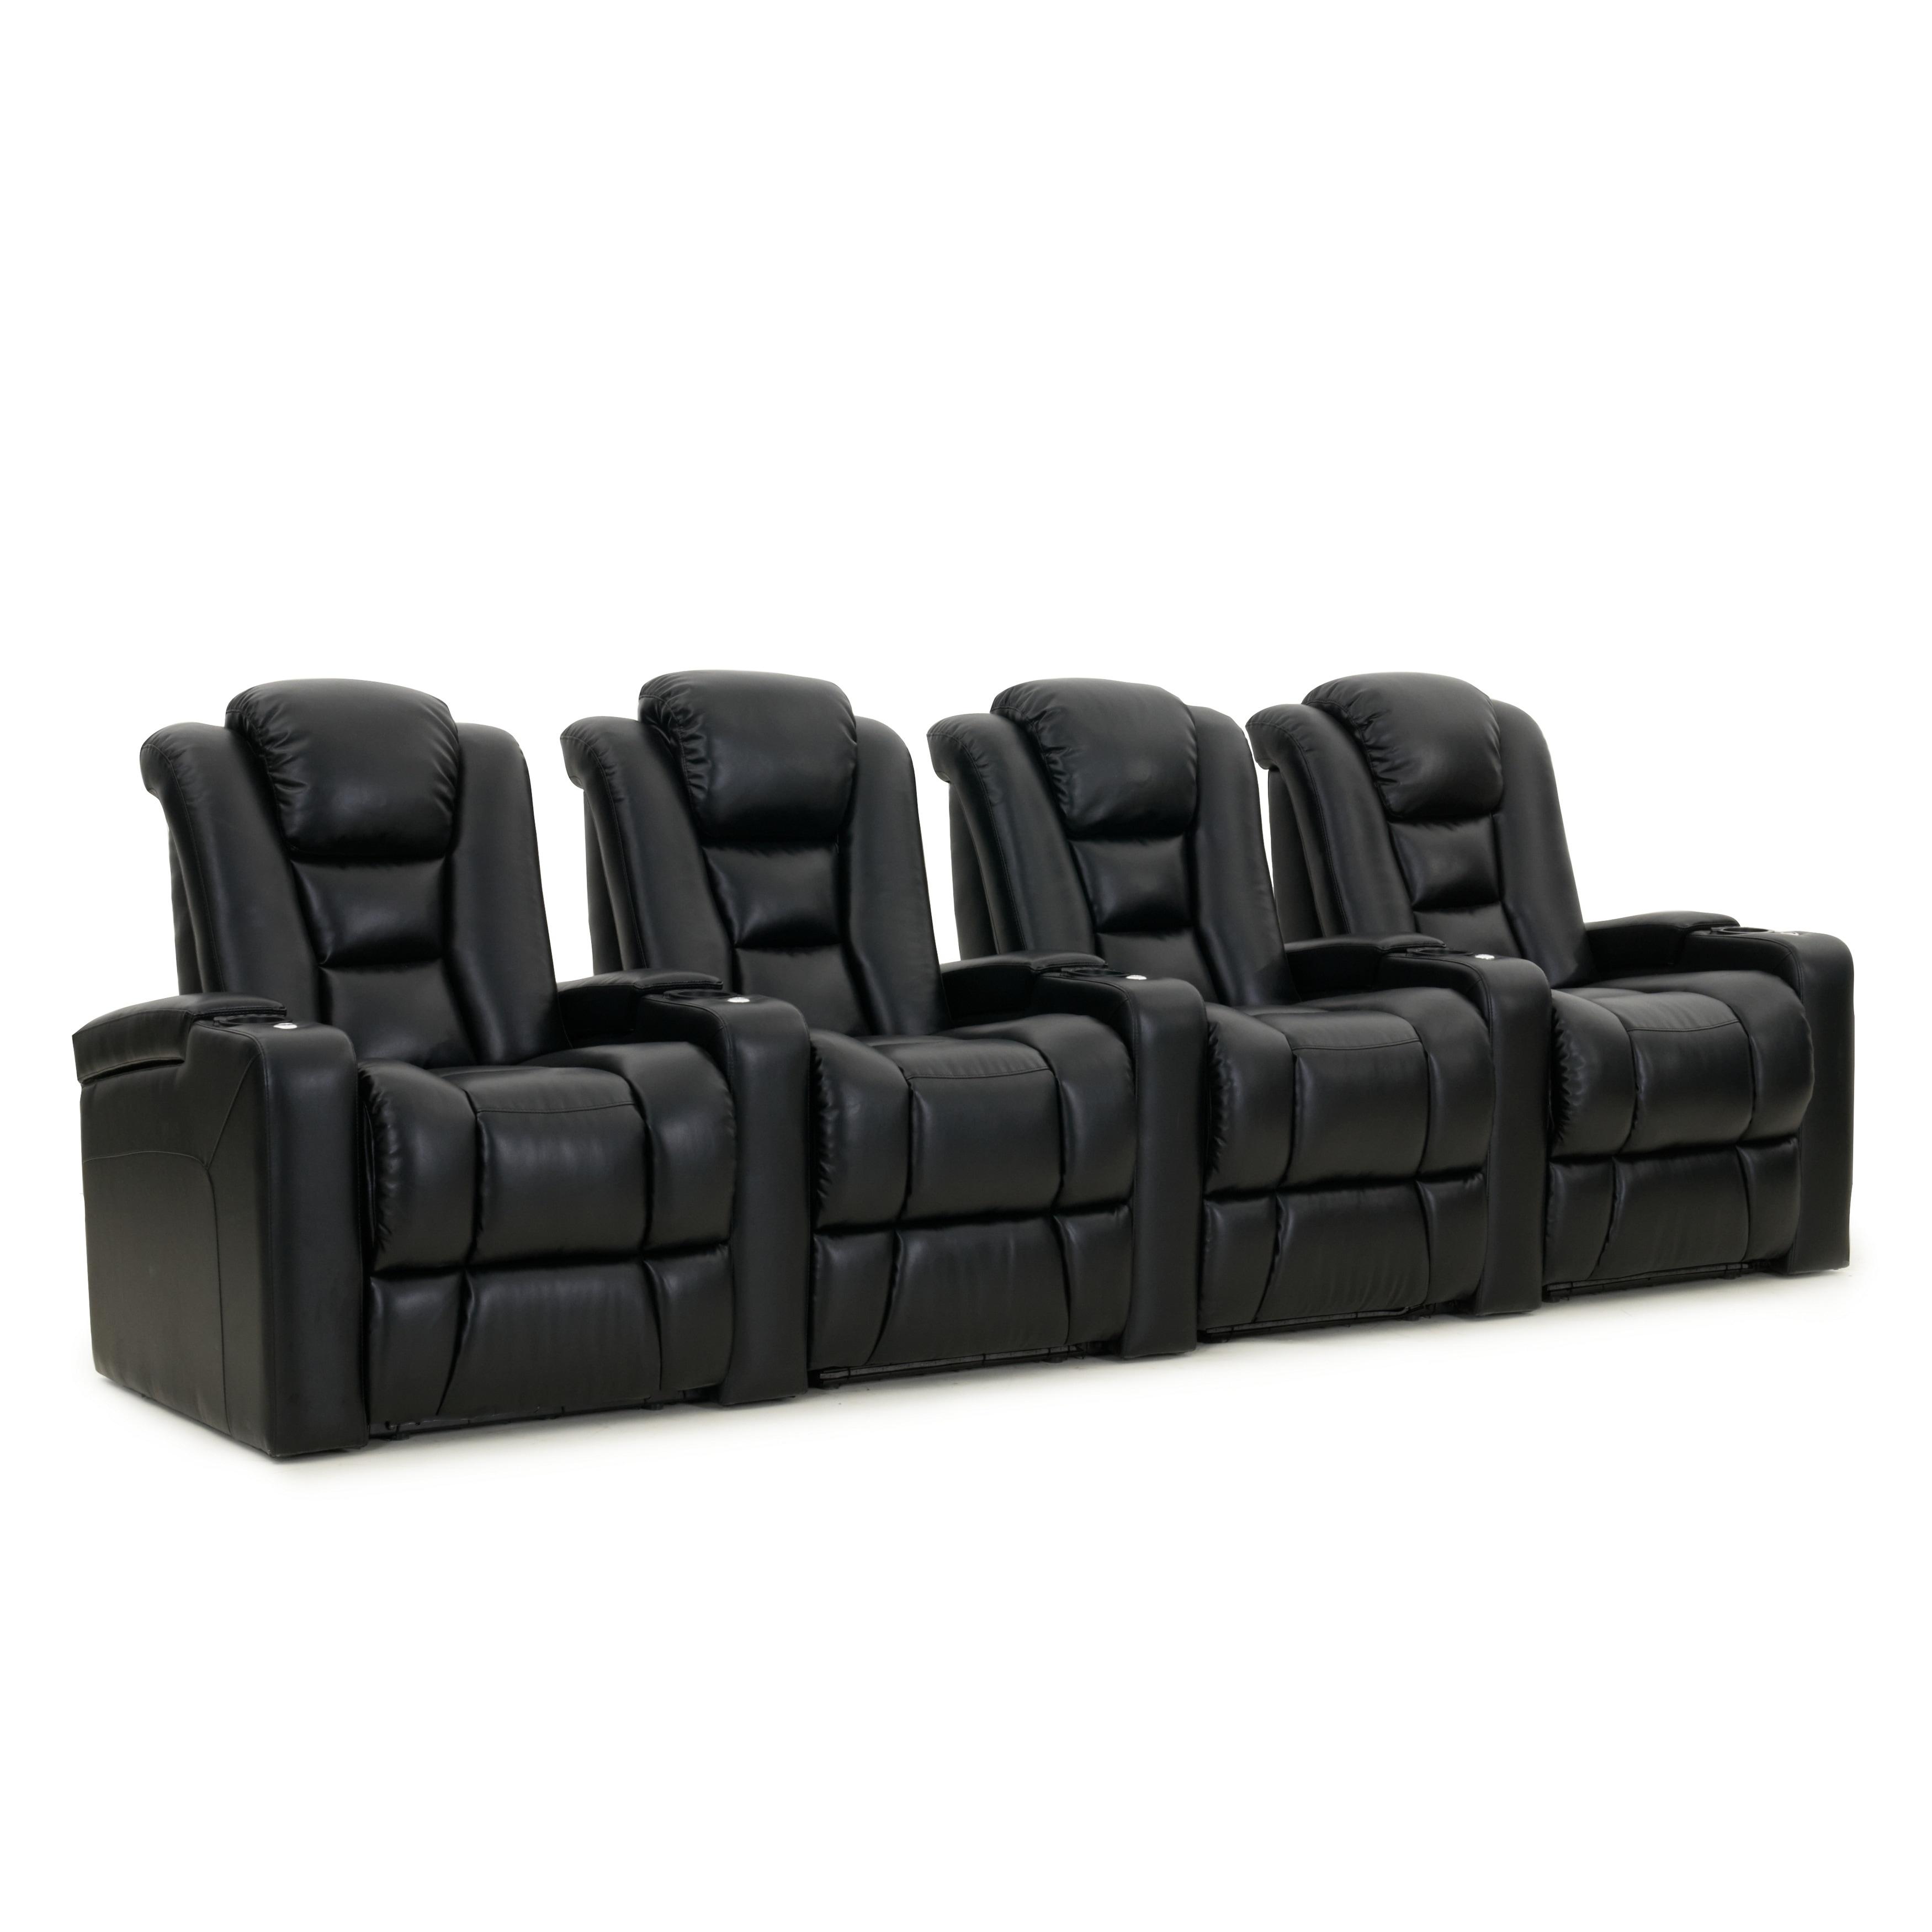 Octane Mega XL950 Motor Headrest Leather Home Theater Seats (Row of 4)